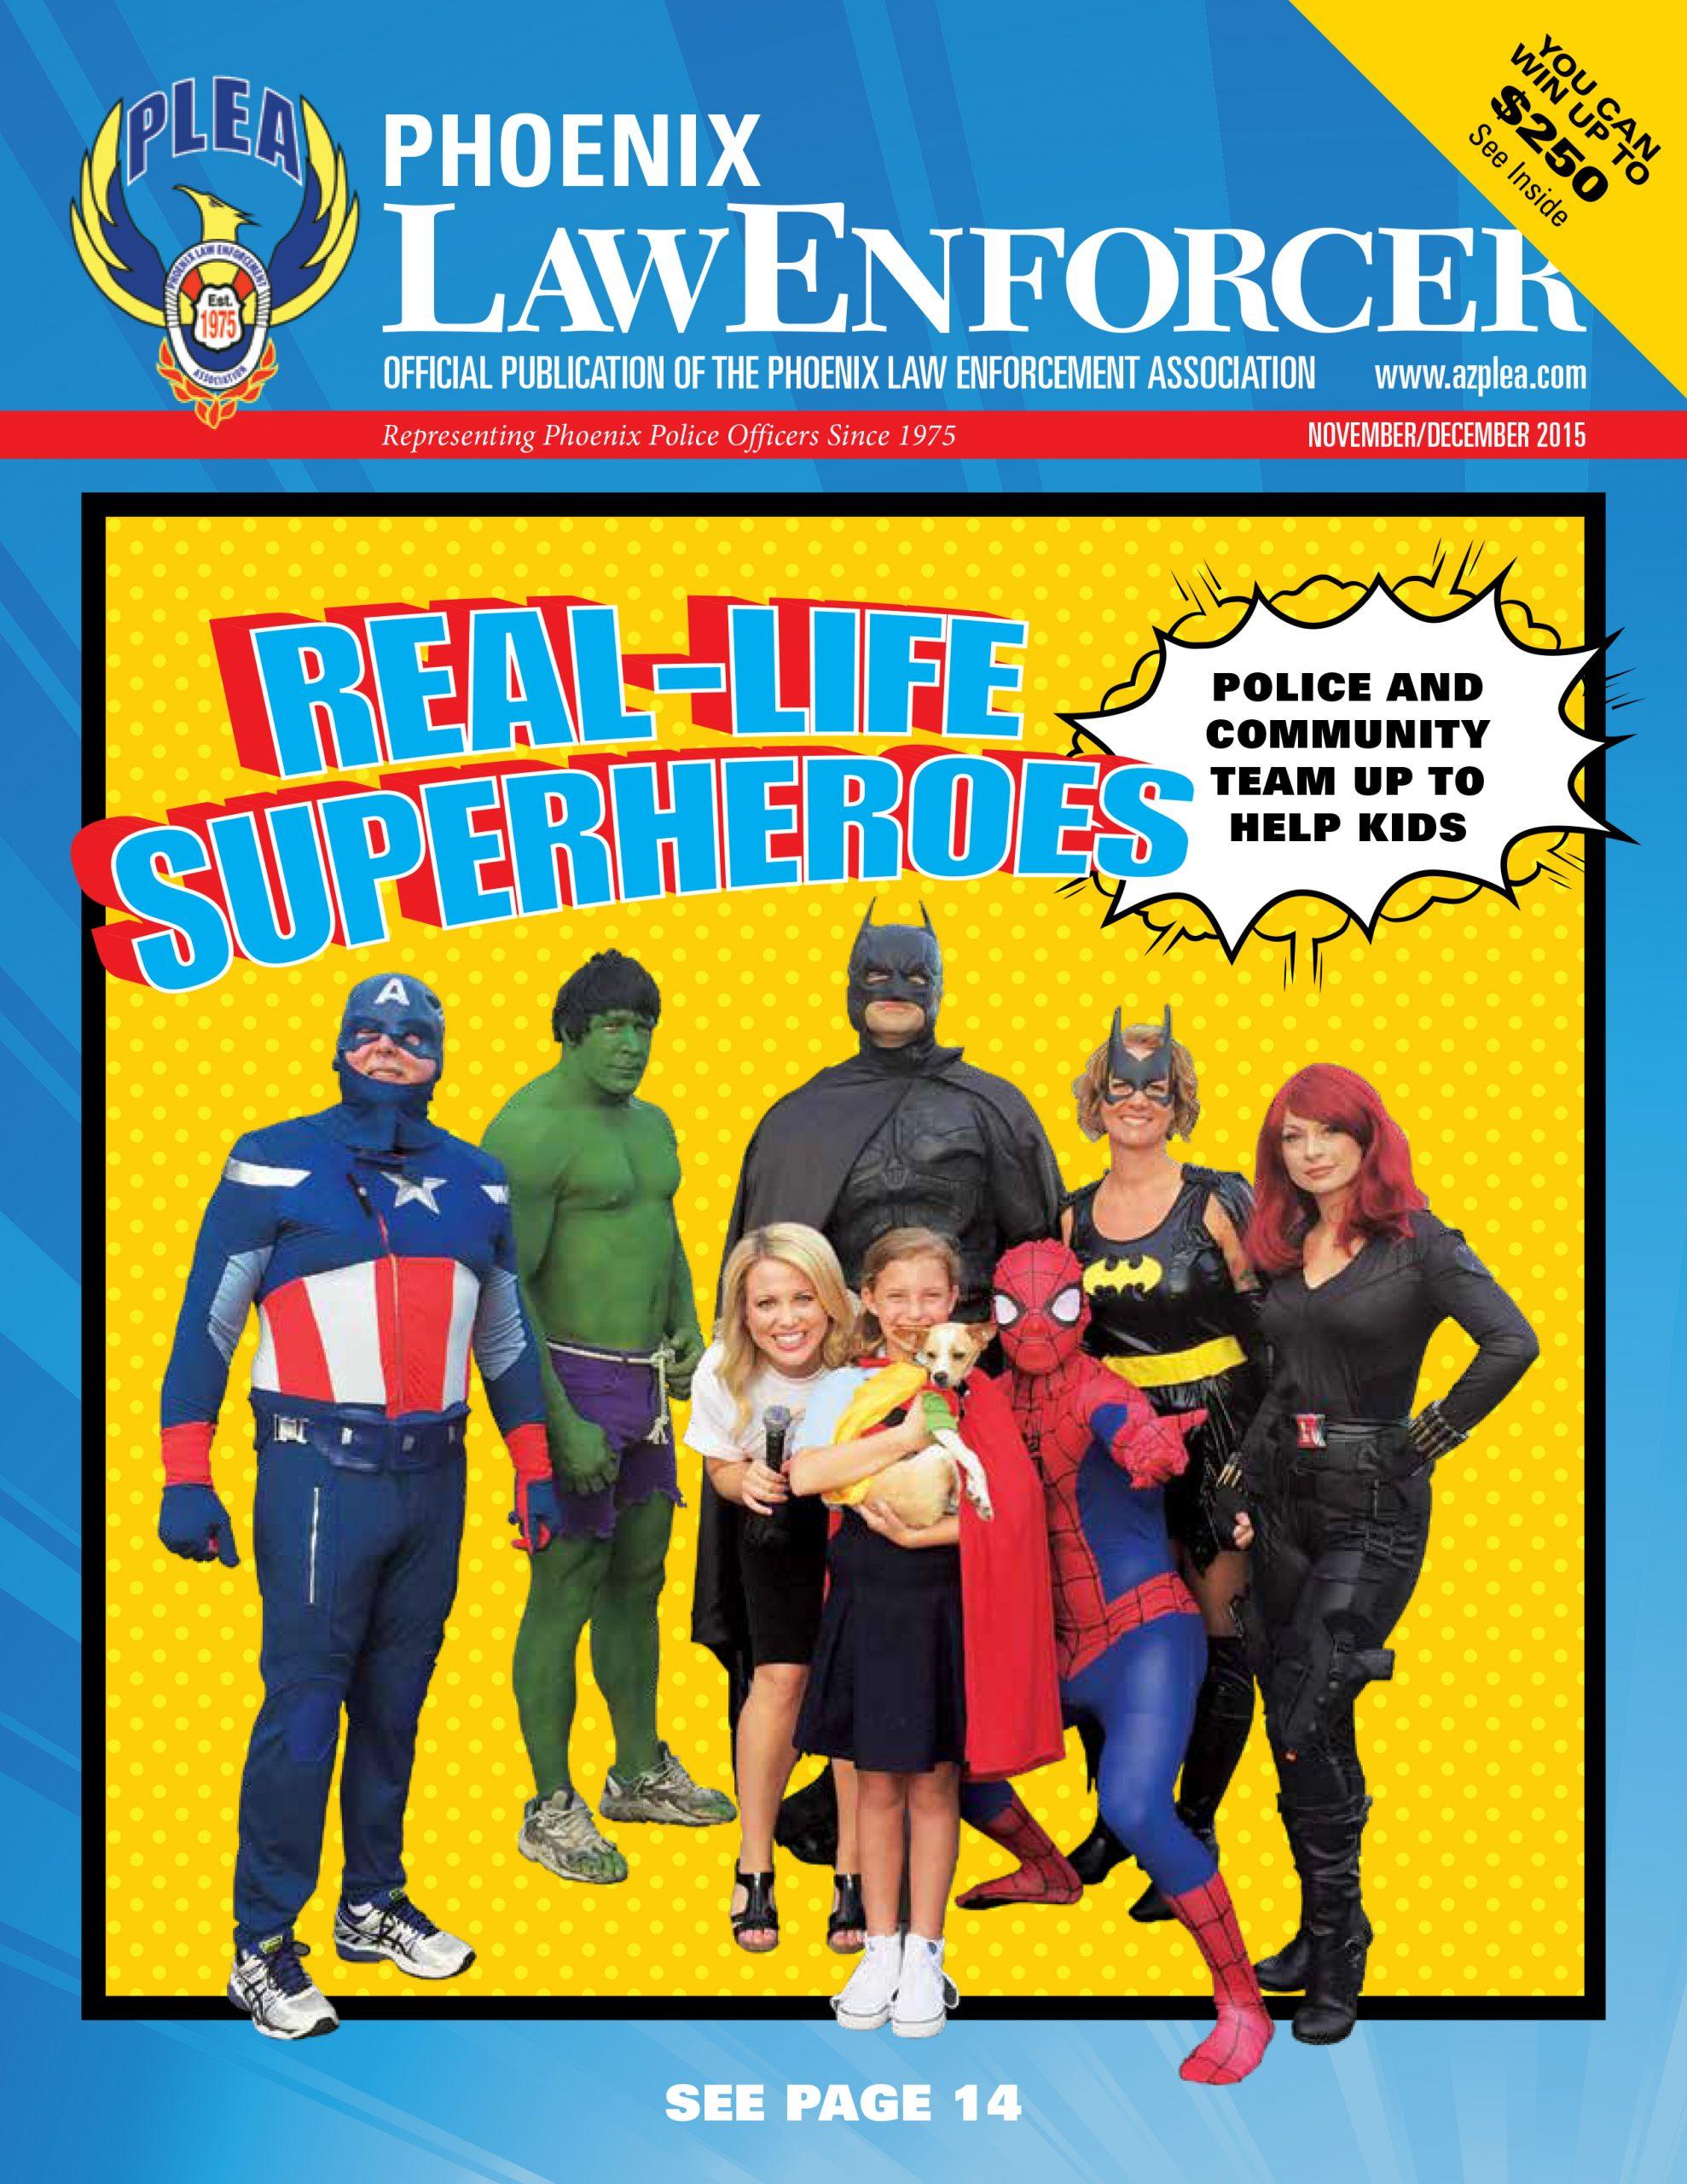 Phoenix Law Enforcer – November/December 2015